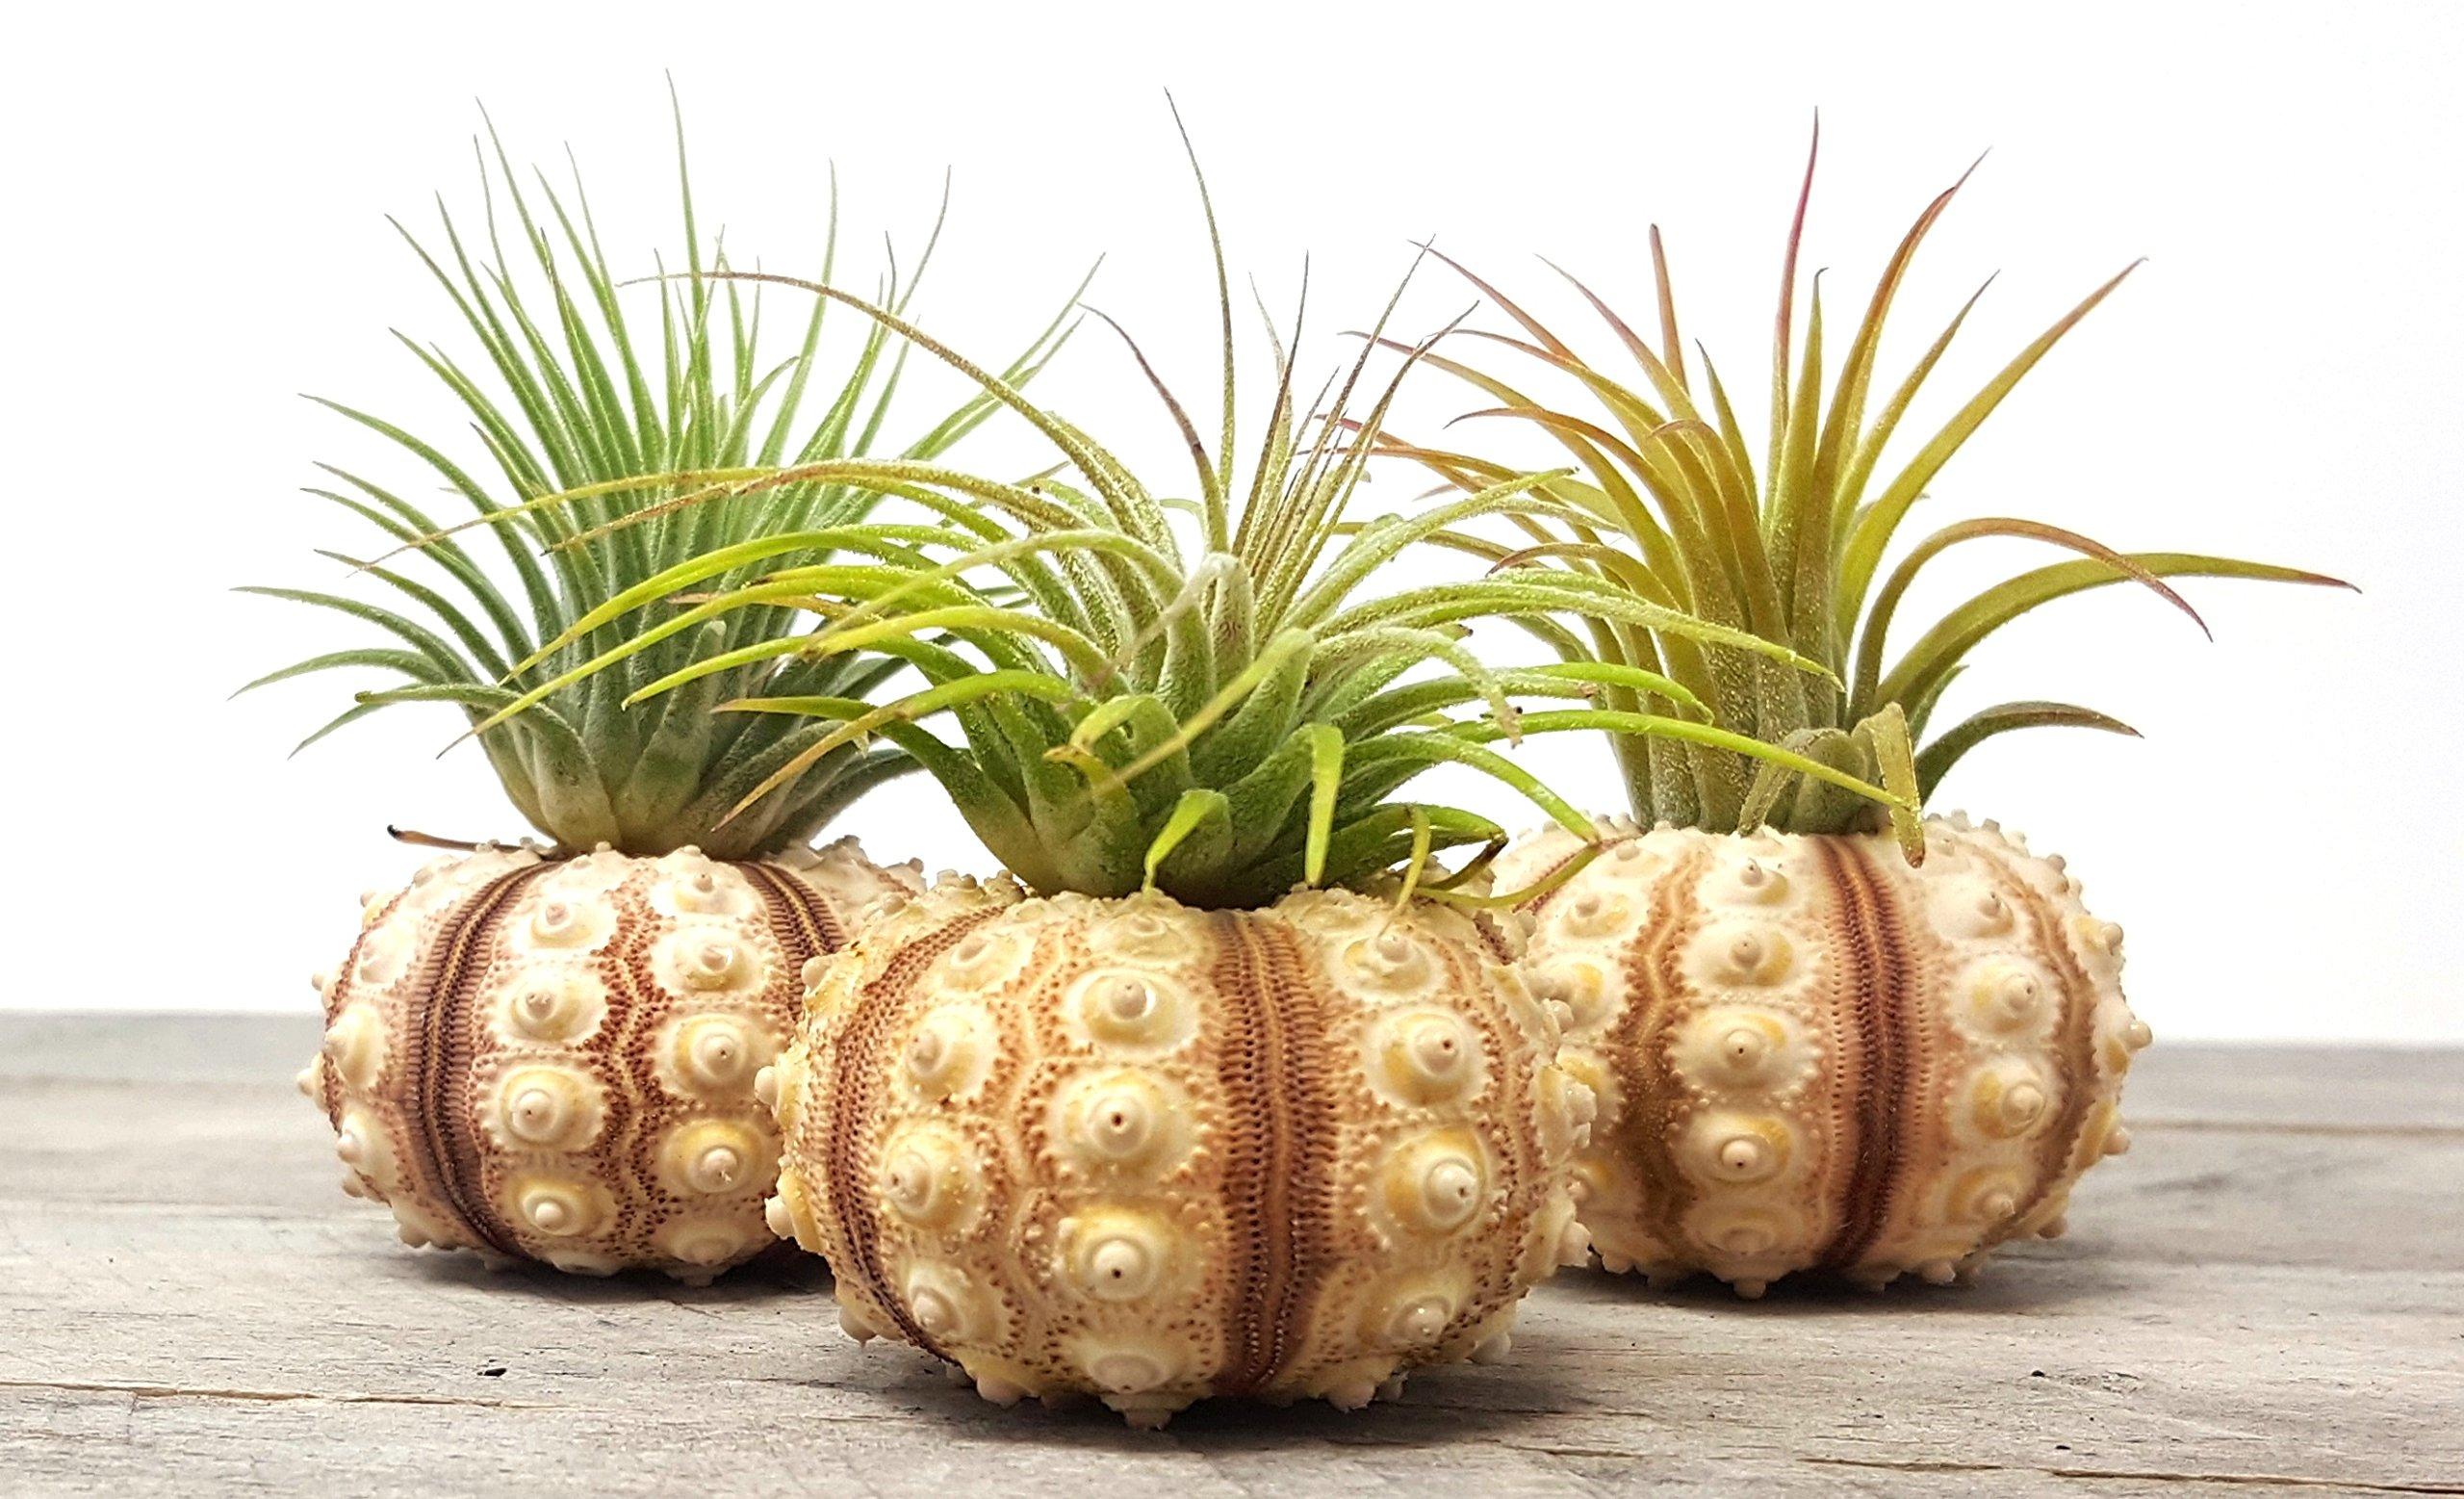 Aura Creations 3 pcs Sputnick Sea Urchin Air Plant Lot/Kit Includes 3 Tillandsia Plants and 3 Urchin Shell